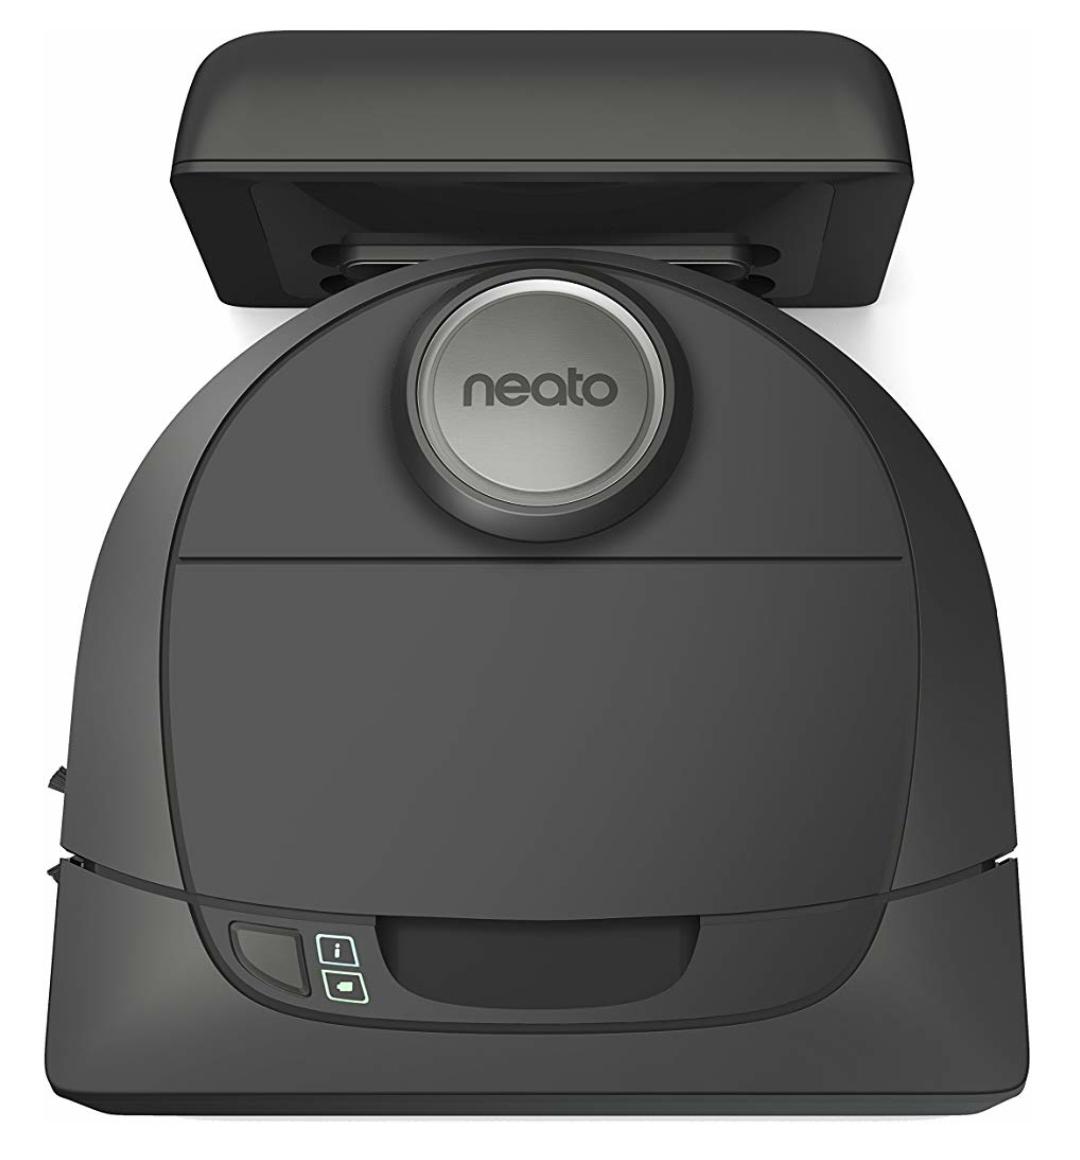 Neato Botvac D5 Connected 945-0239 (D502) selbstnavigierender Saugroboter inkl. Ladestation & App (kompatibel m. Alexa)